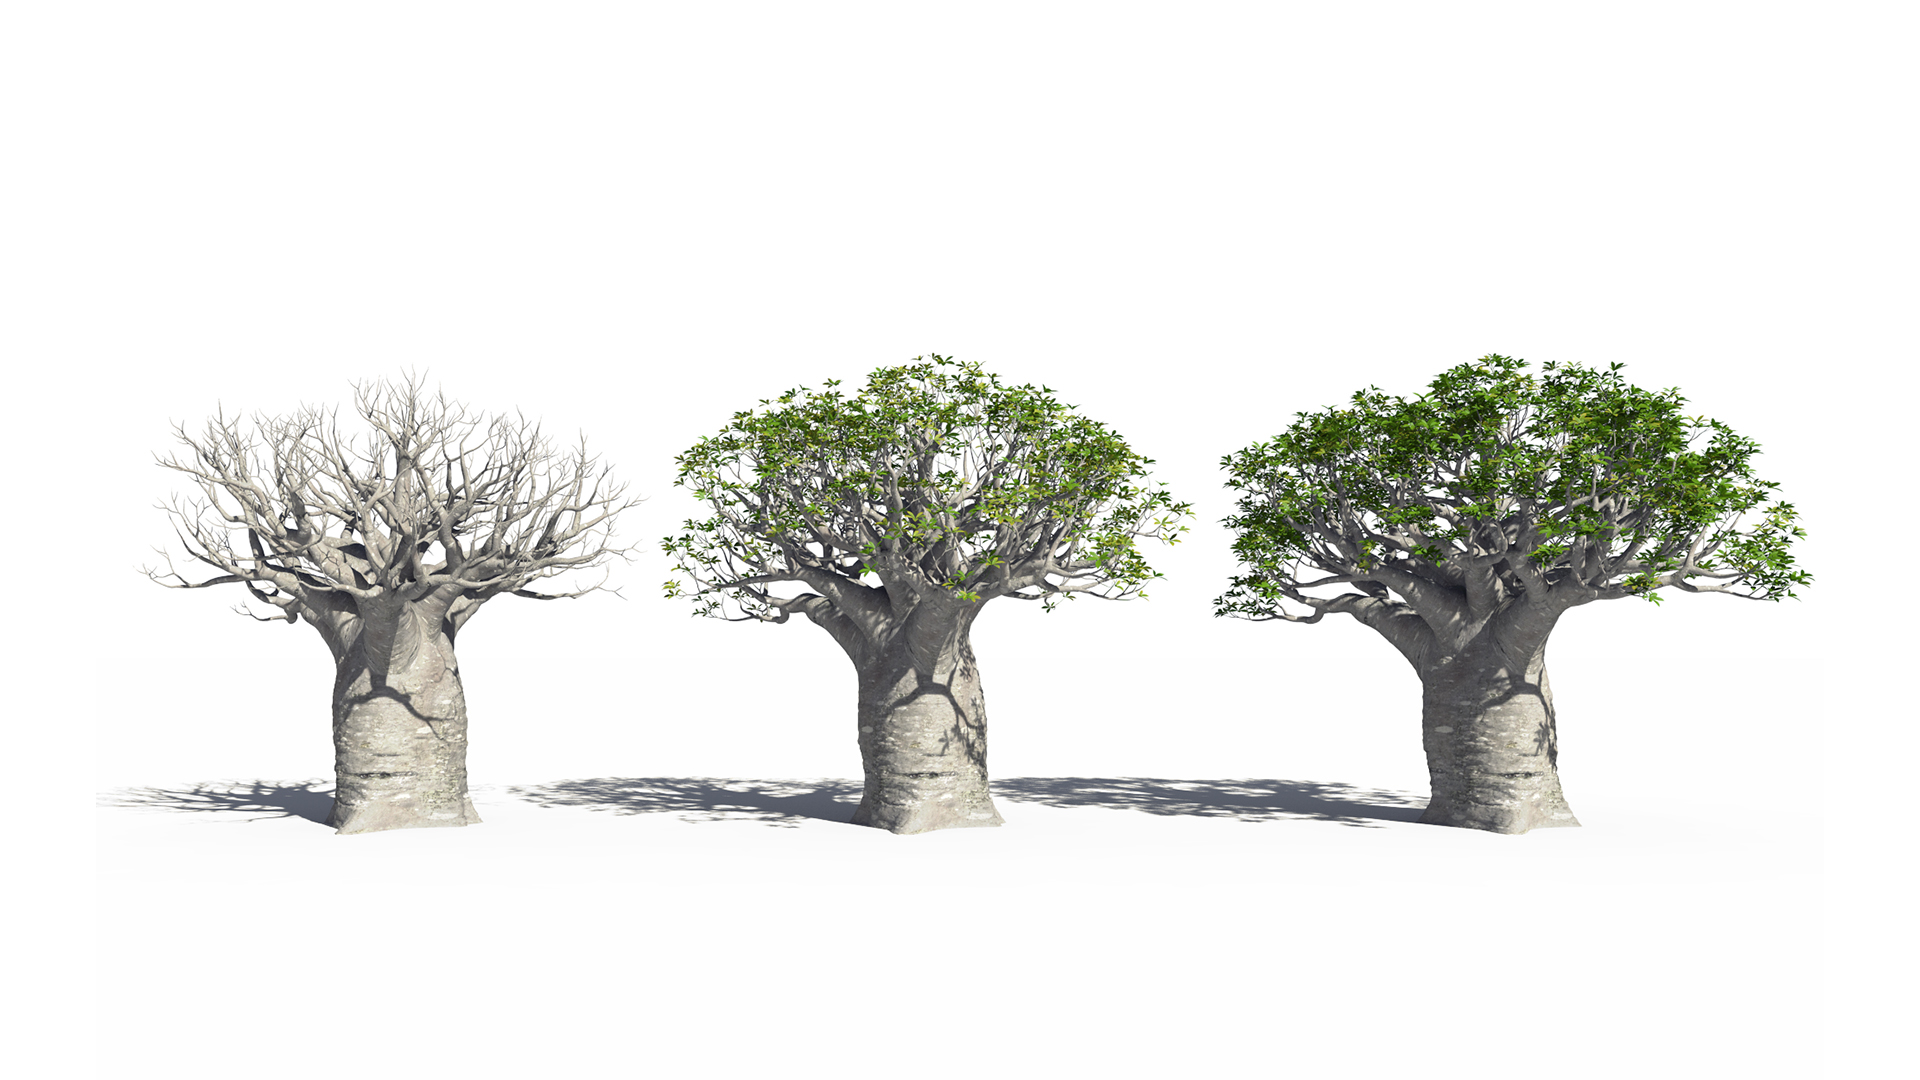 3D model of the African continental baobab Adansonia digitata health variations